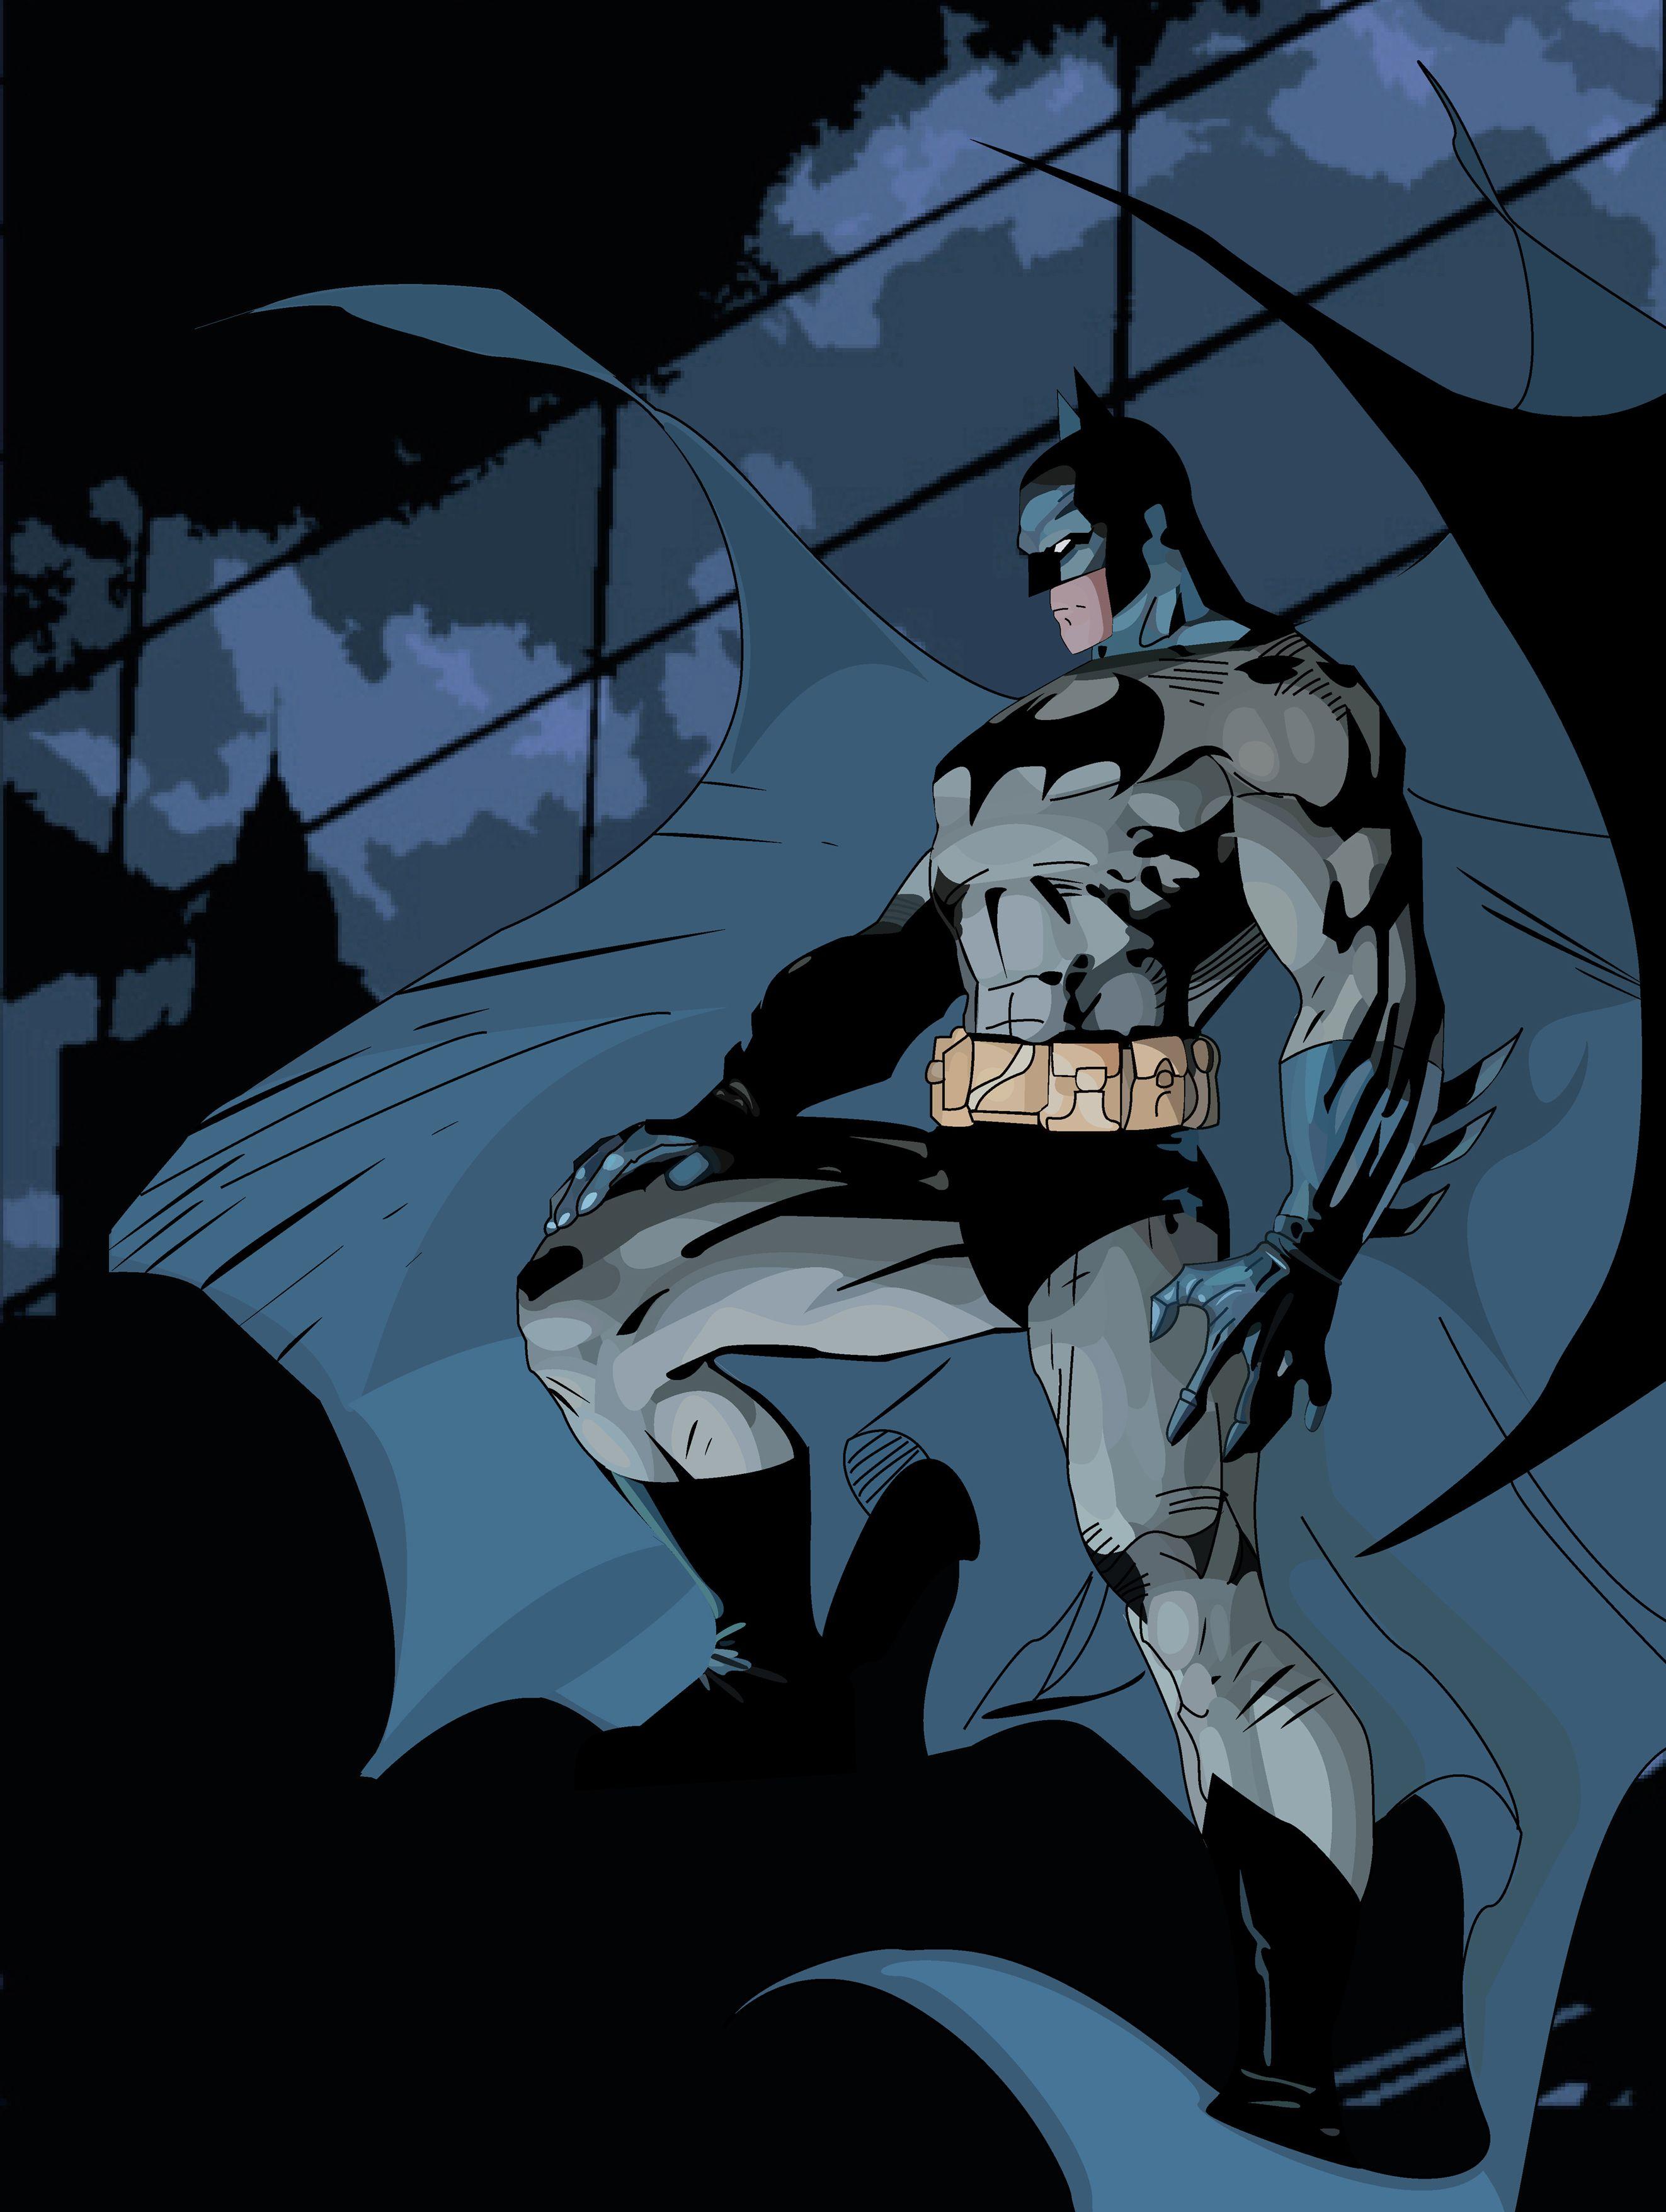 Бэтмен картинки из комикса